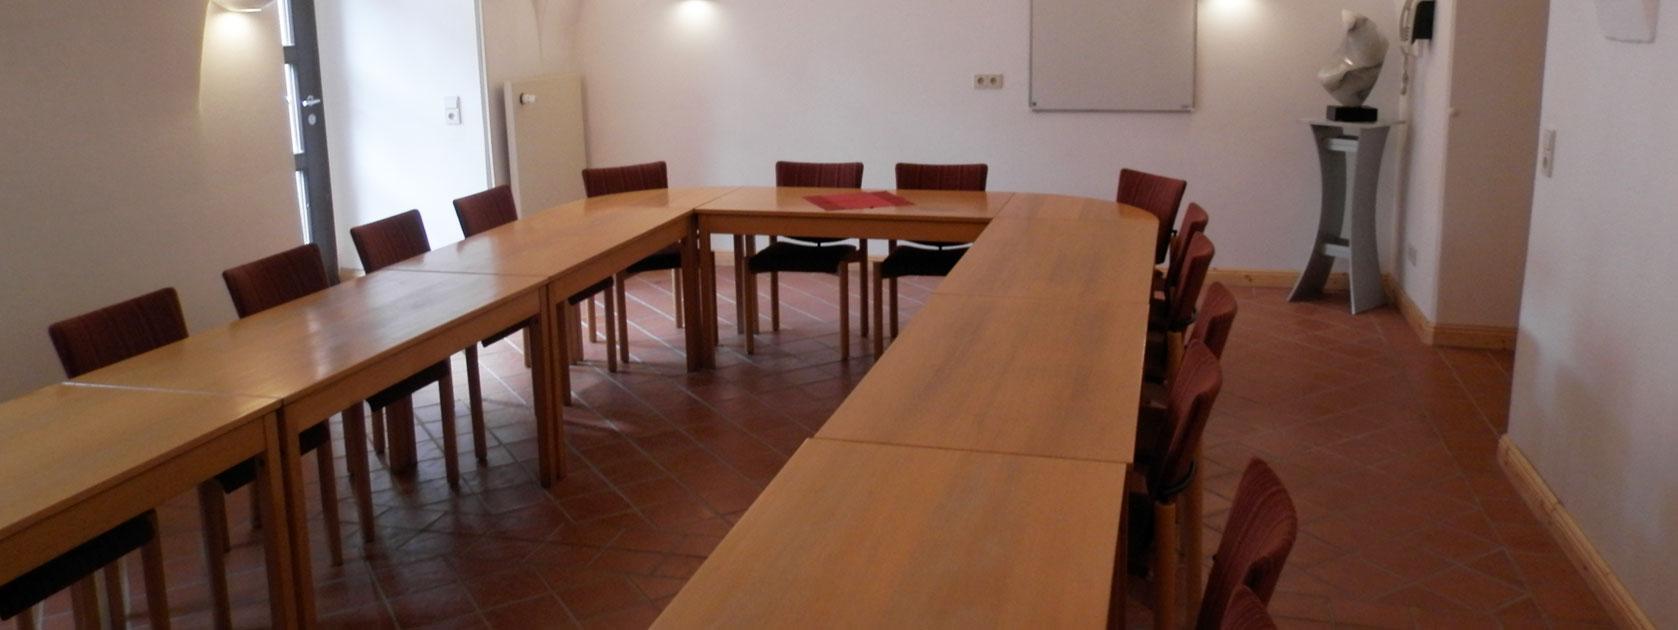 Seminarraum St. Hedwig 1